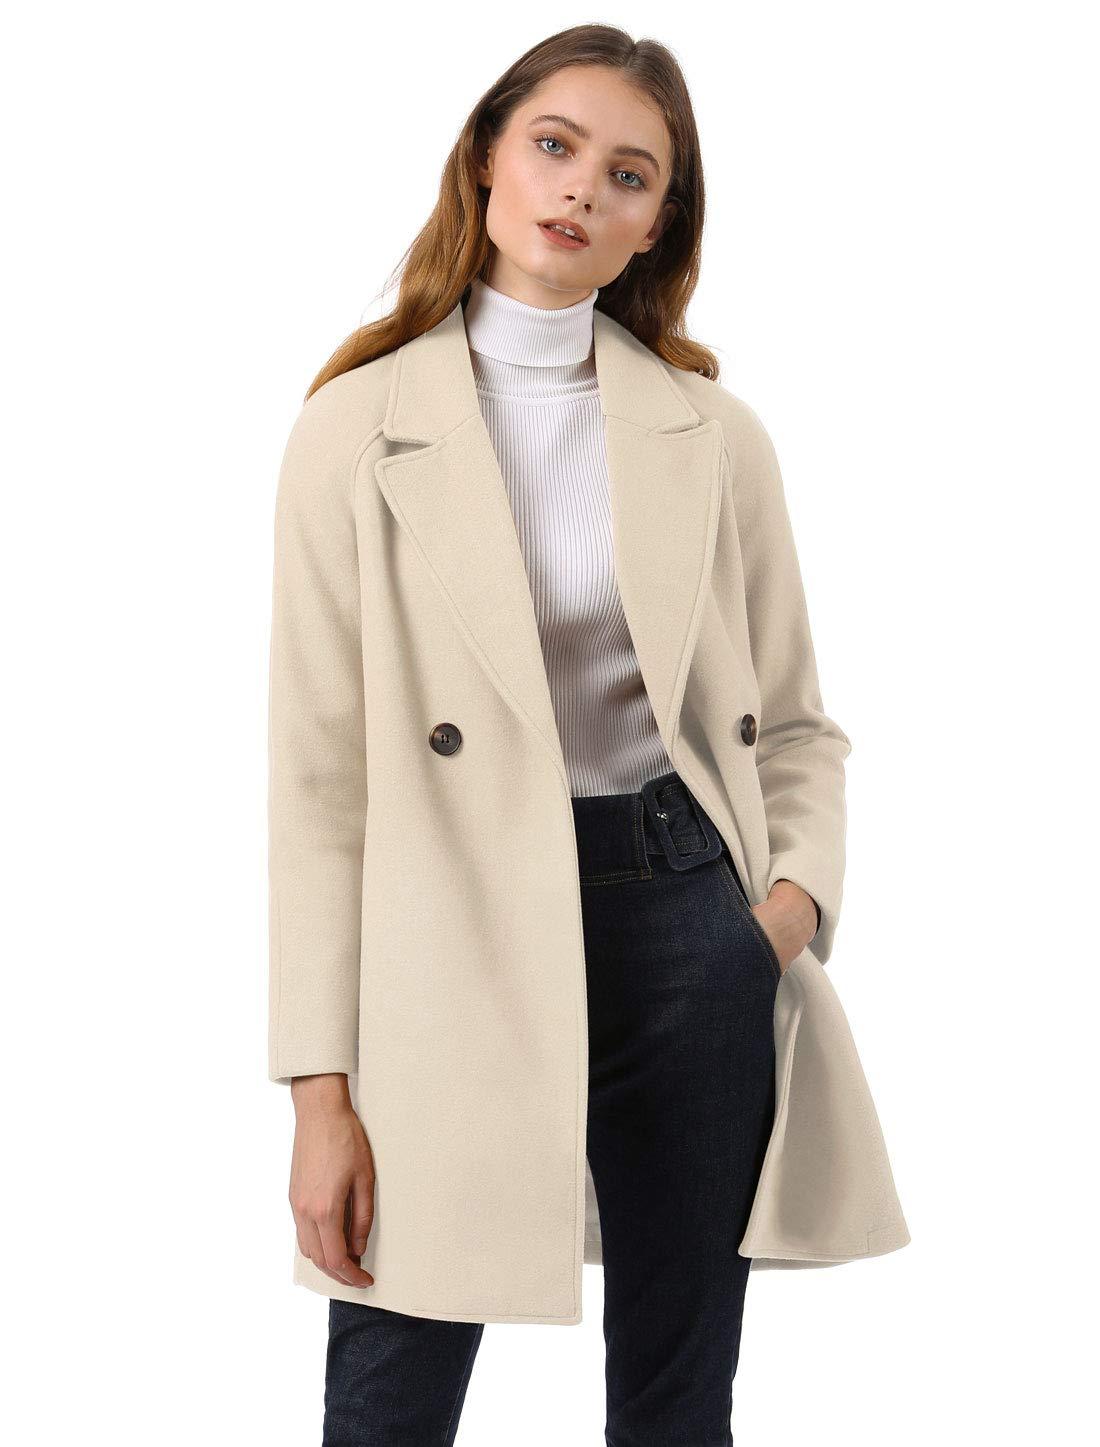 Allegra K Women's Notched Lapel Double Breasted Raglan Winter Coats Cream White L (US 14) by Allegra K